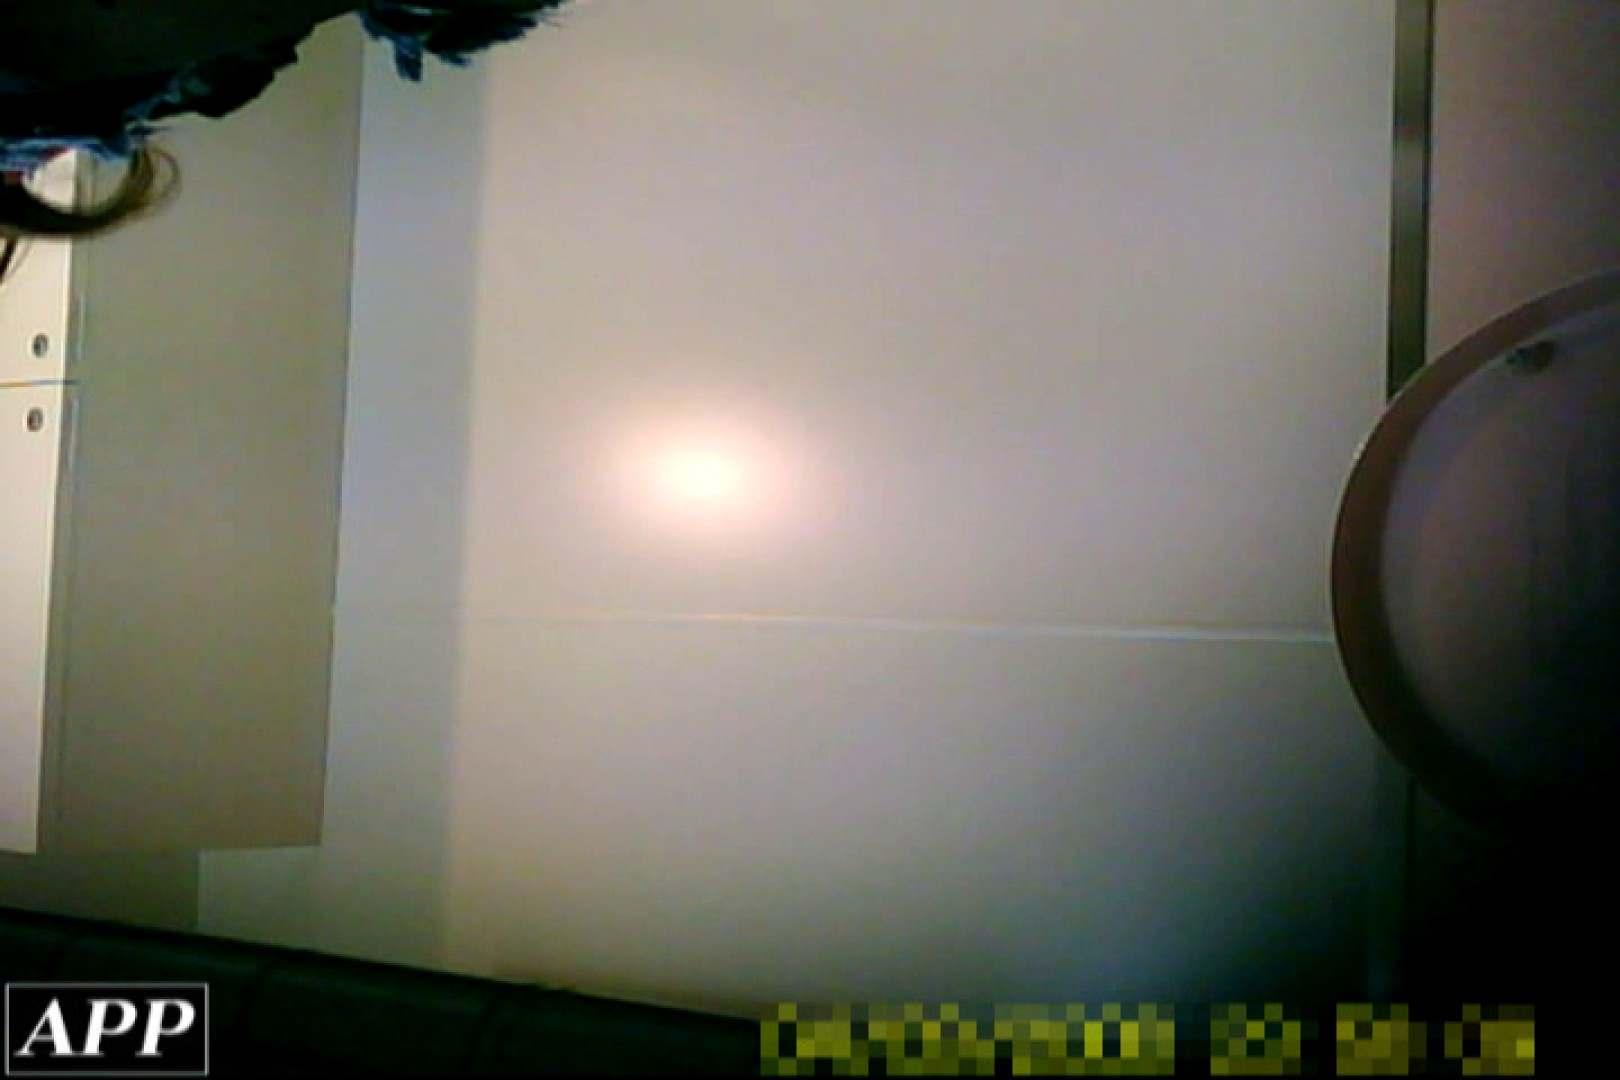 3視点洗面所 vol.023 洗面所 | OLセックス  85画像 27